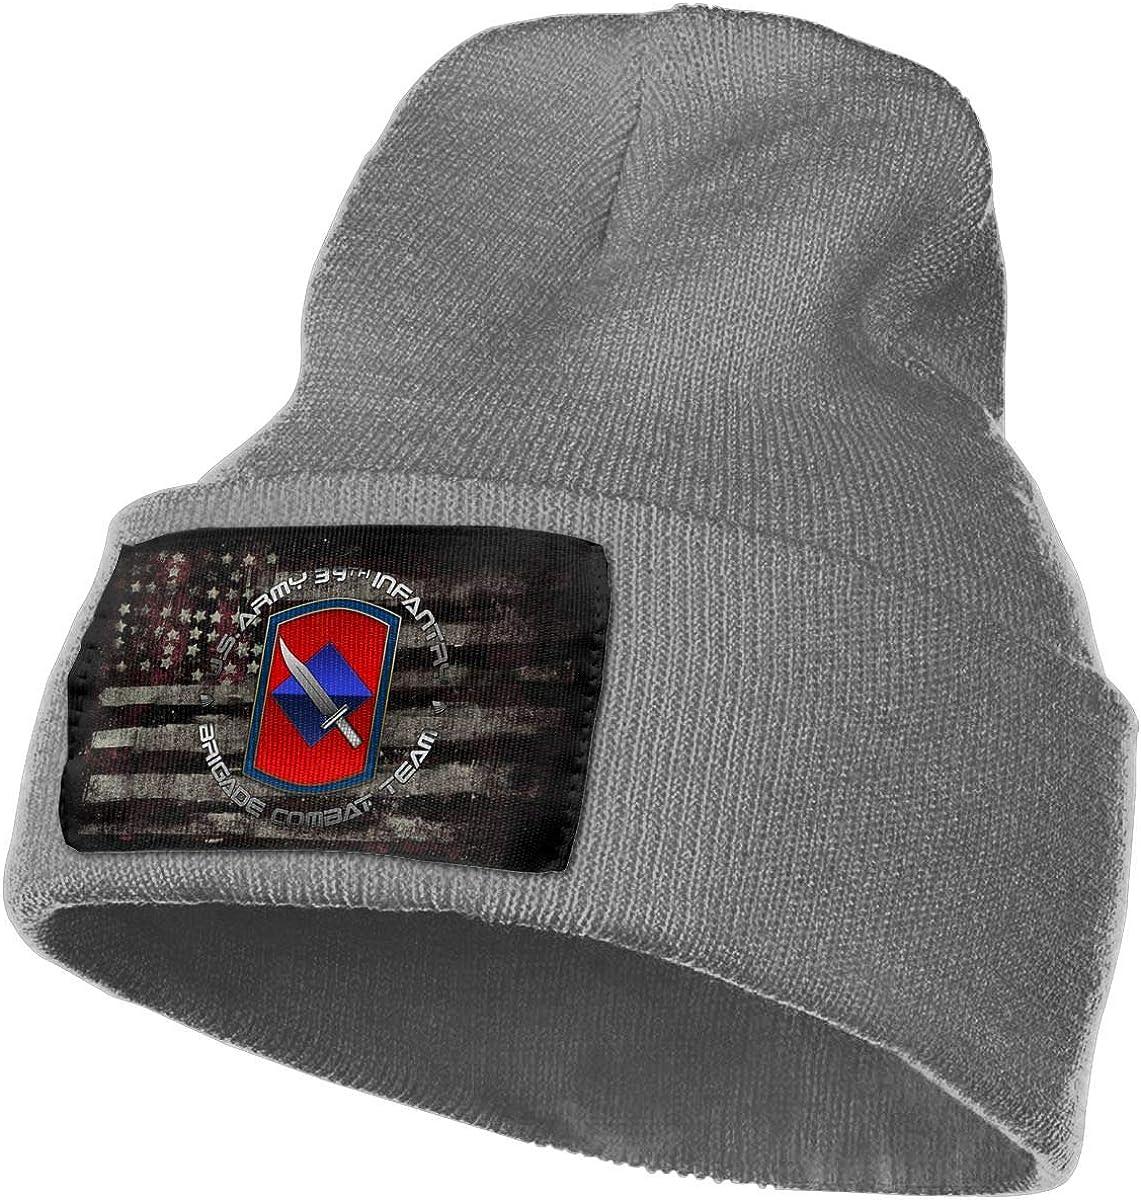 39th Infantry Brigade SSI Mens Beanie Cap Skull Cap Winter Warm Knitting Hats.